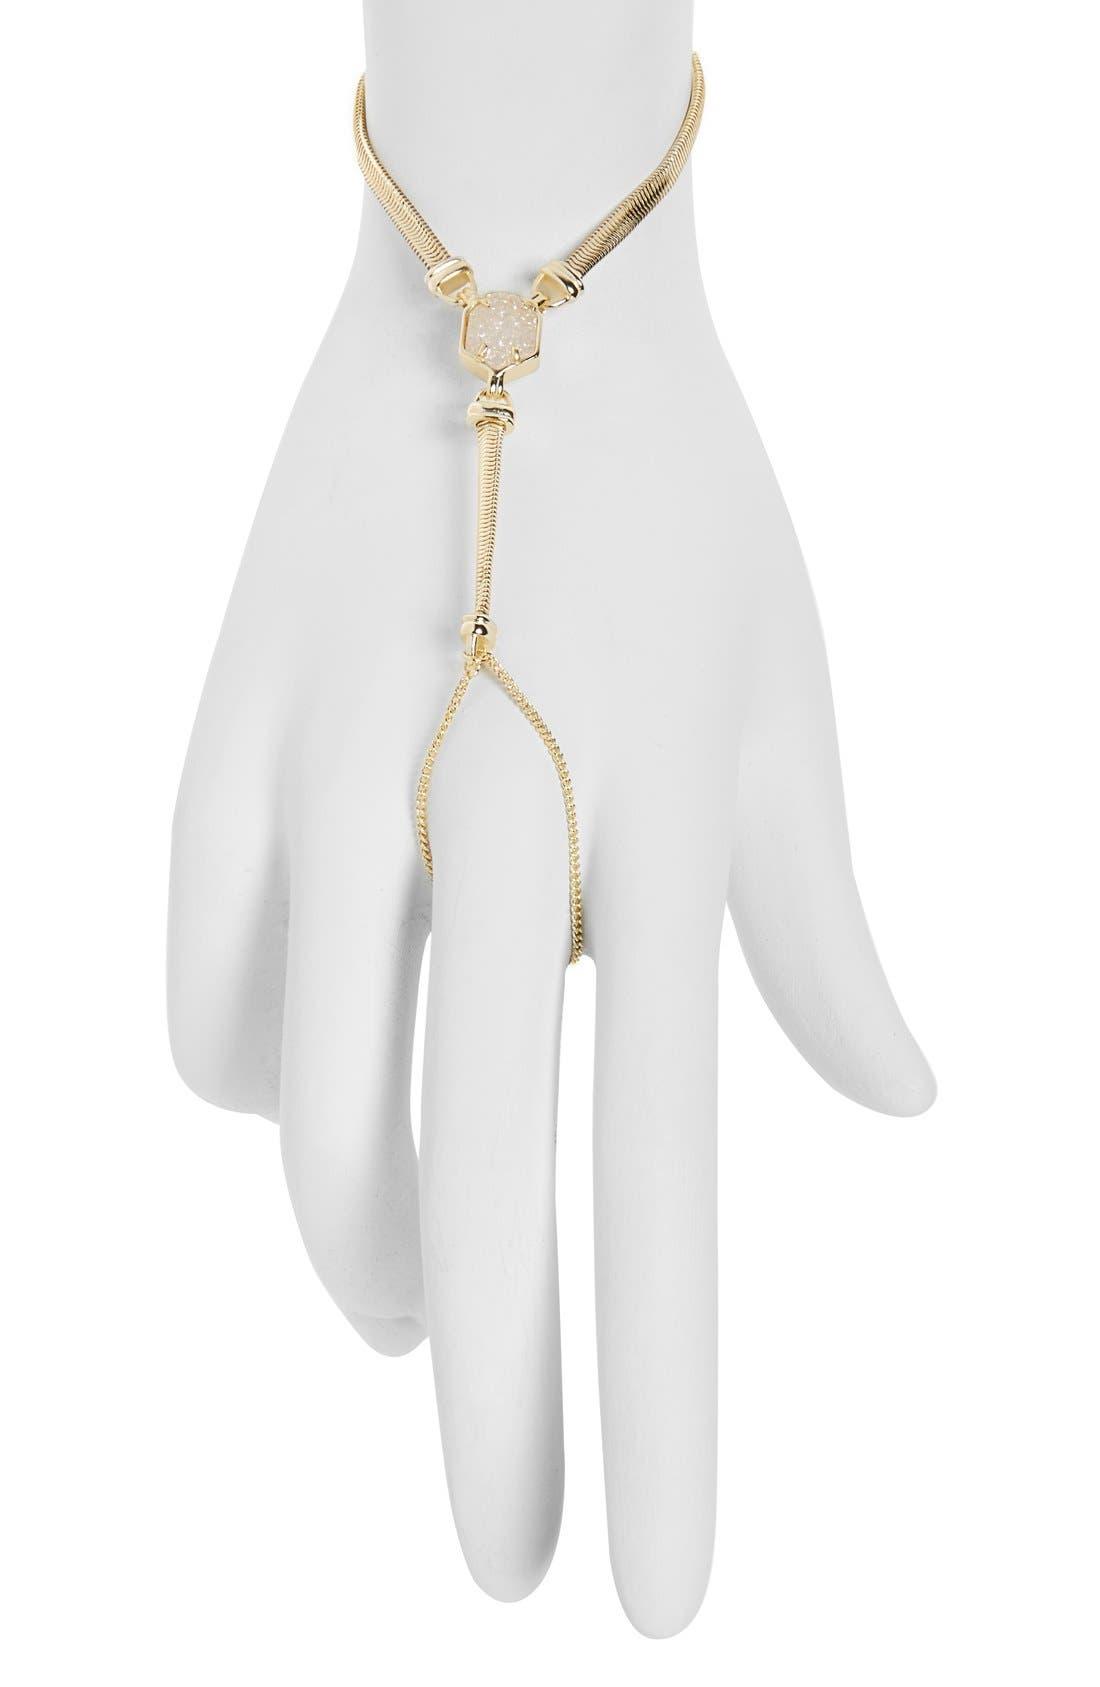 Main Image - Kendra Scott 'Carlin' Hand Chain